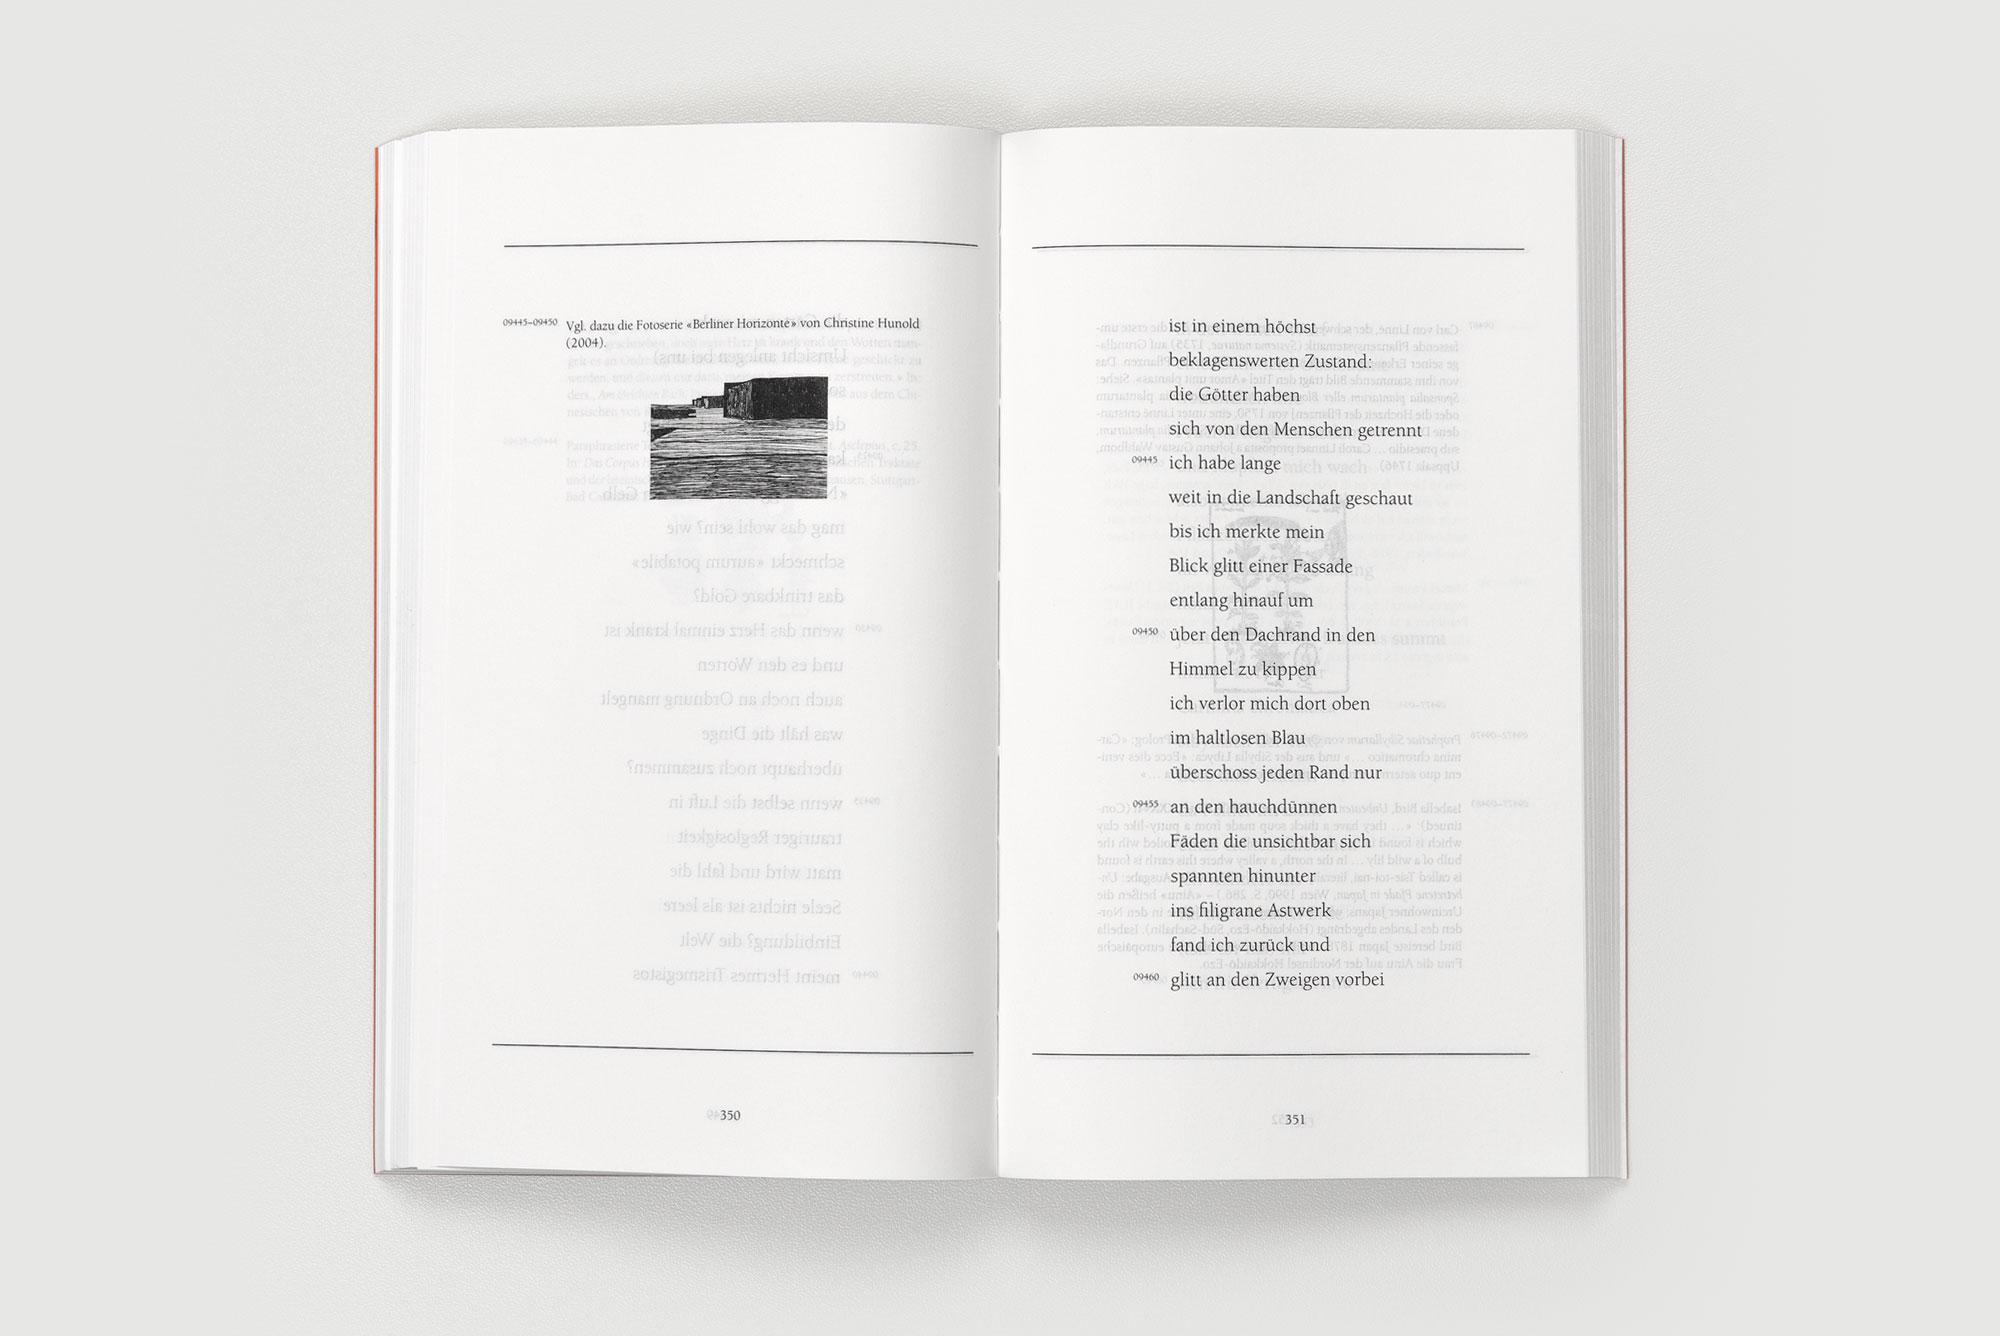 Frand Dodel – Nicht bei Trost, haiku s350 ©Atelier Pol